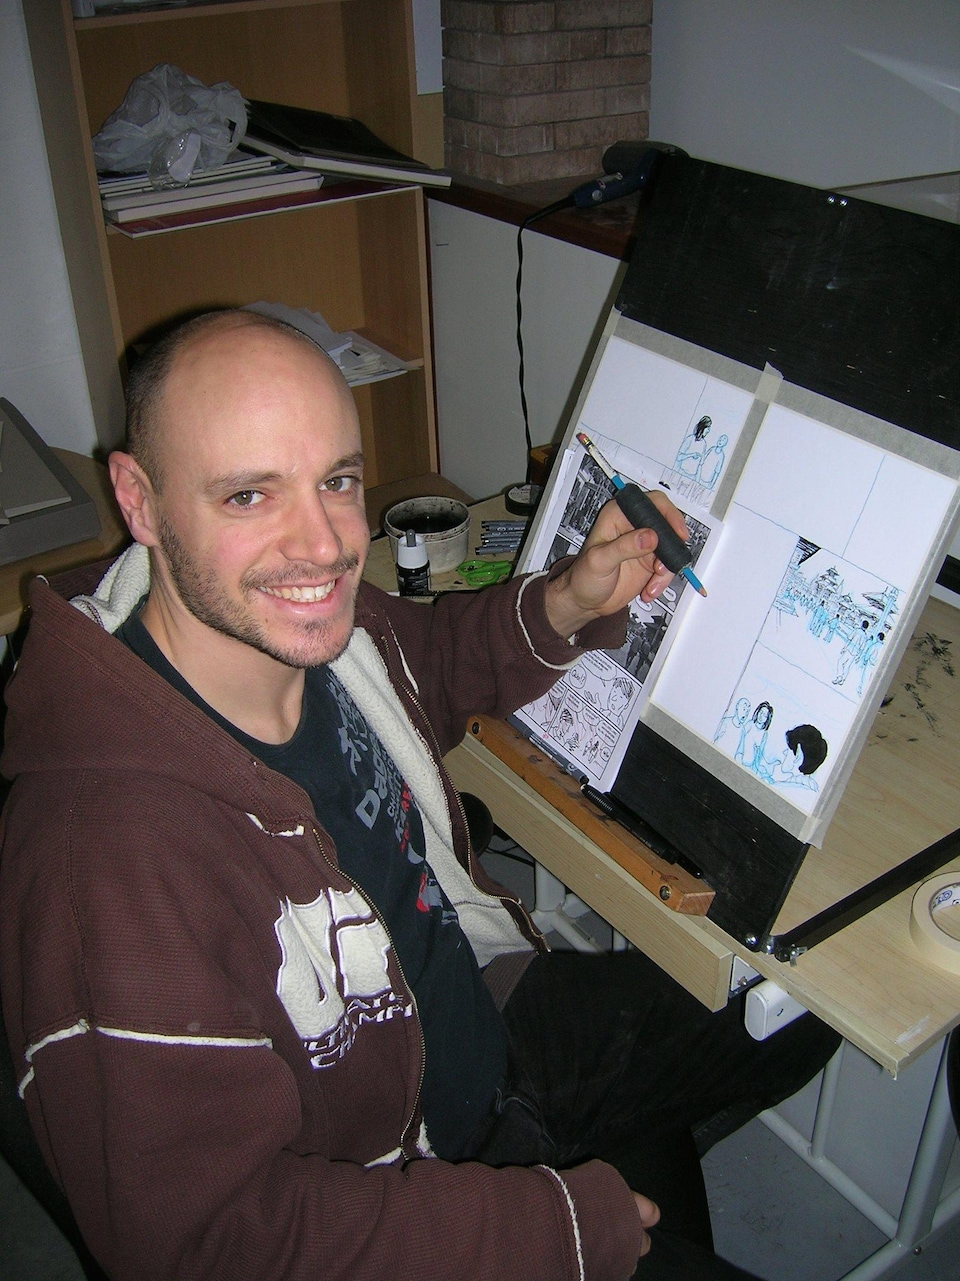 Jean-Sébastien Bérubé devant la table à dessin